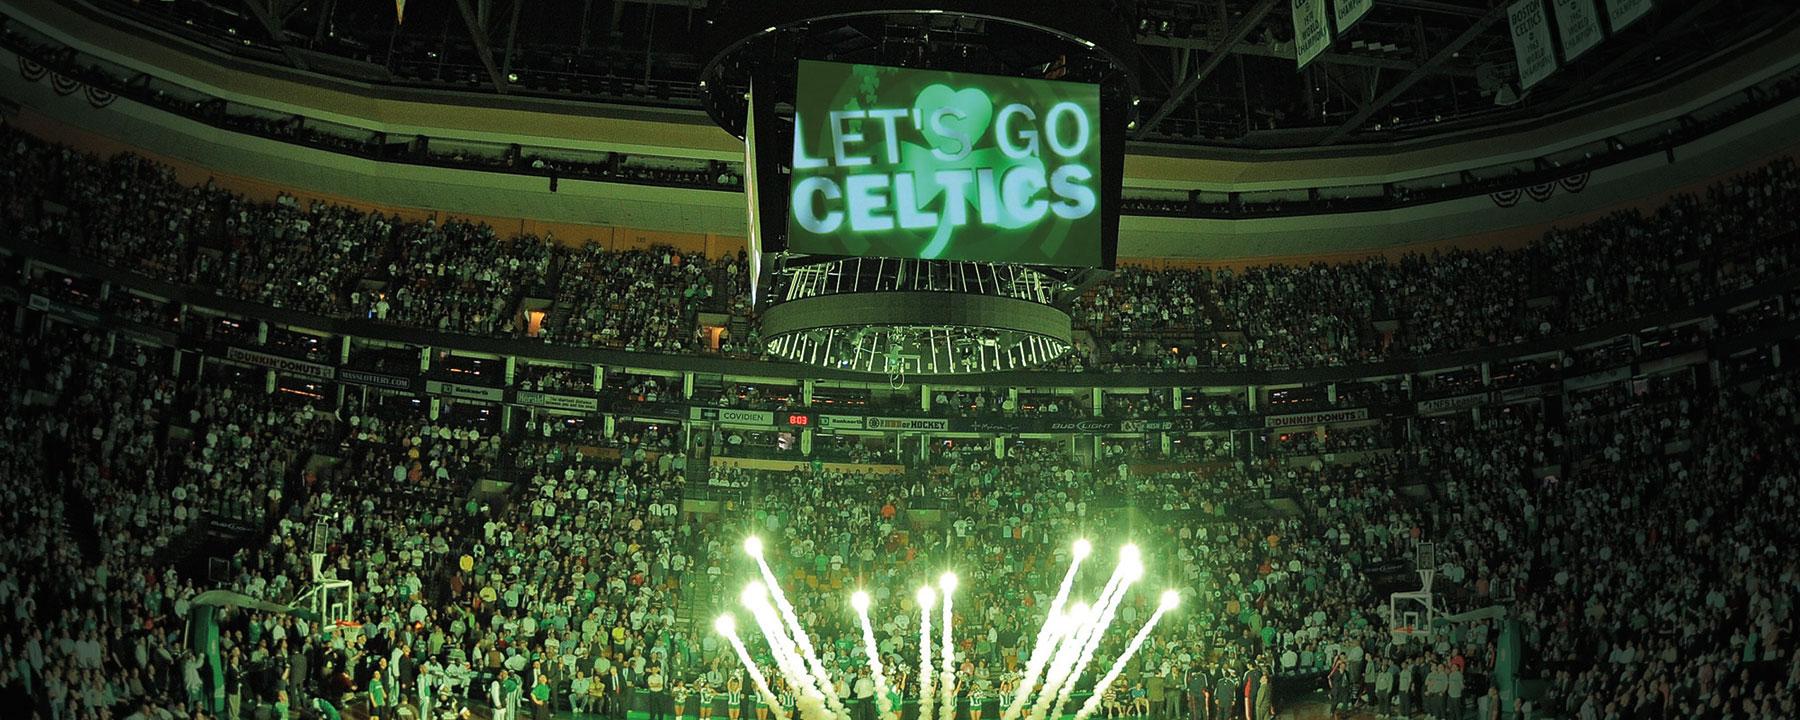 2018-Landing-Page-Celtics